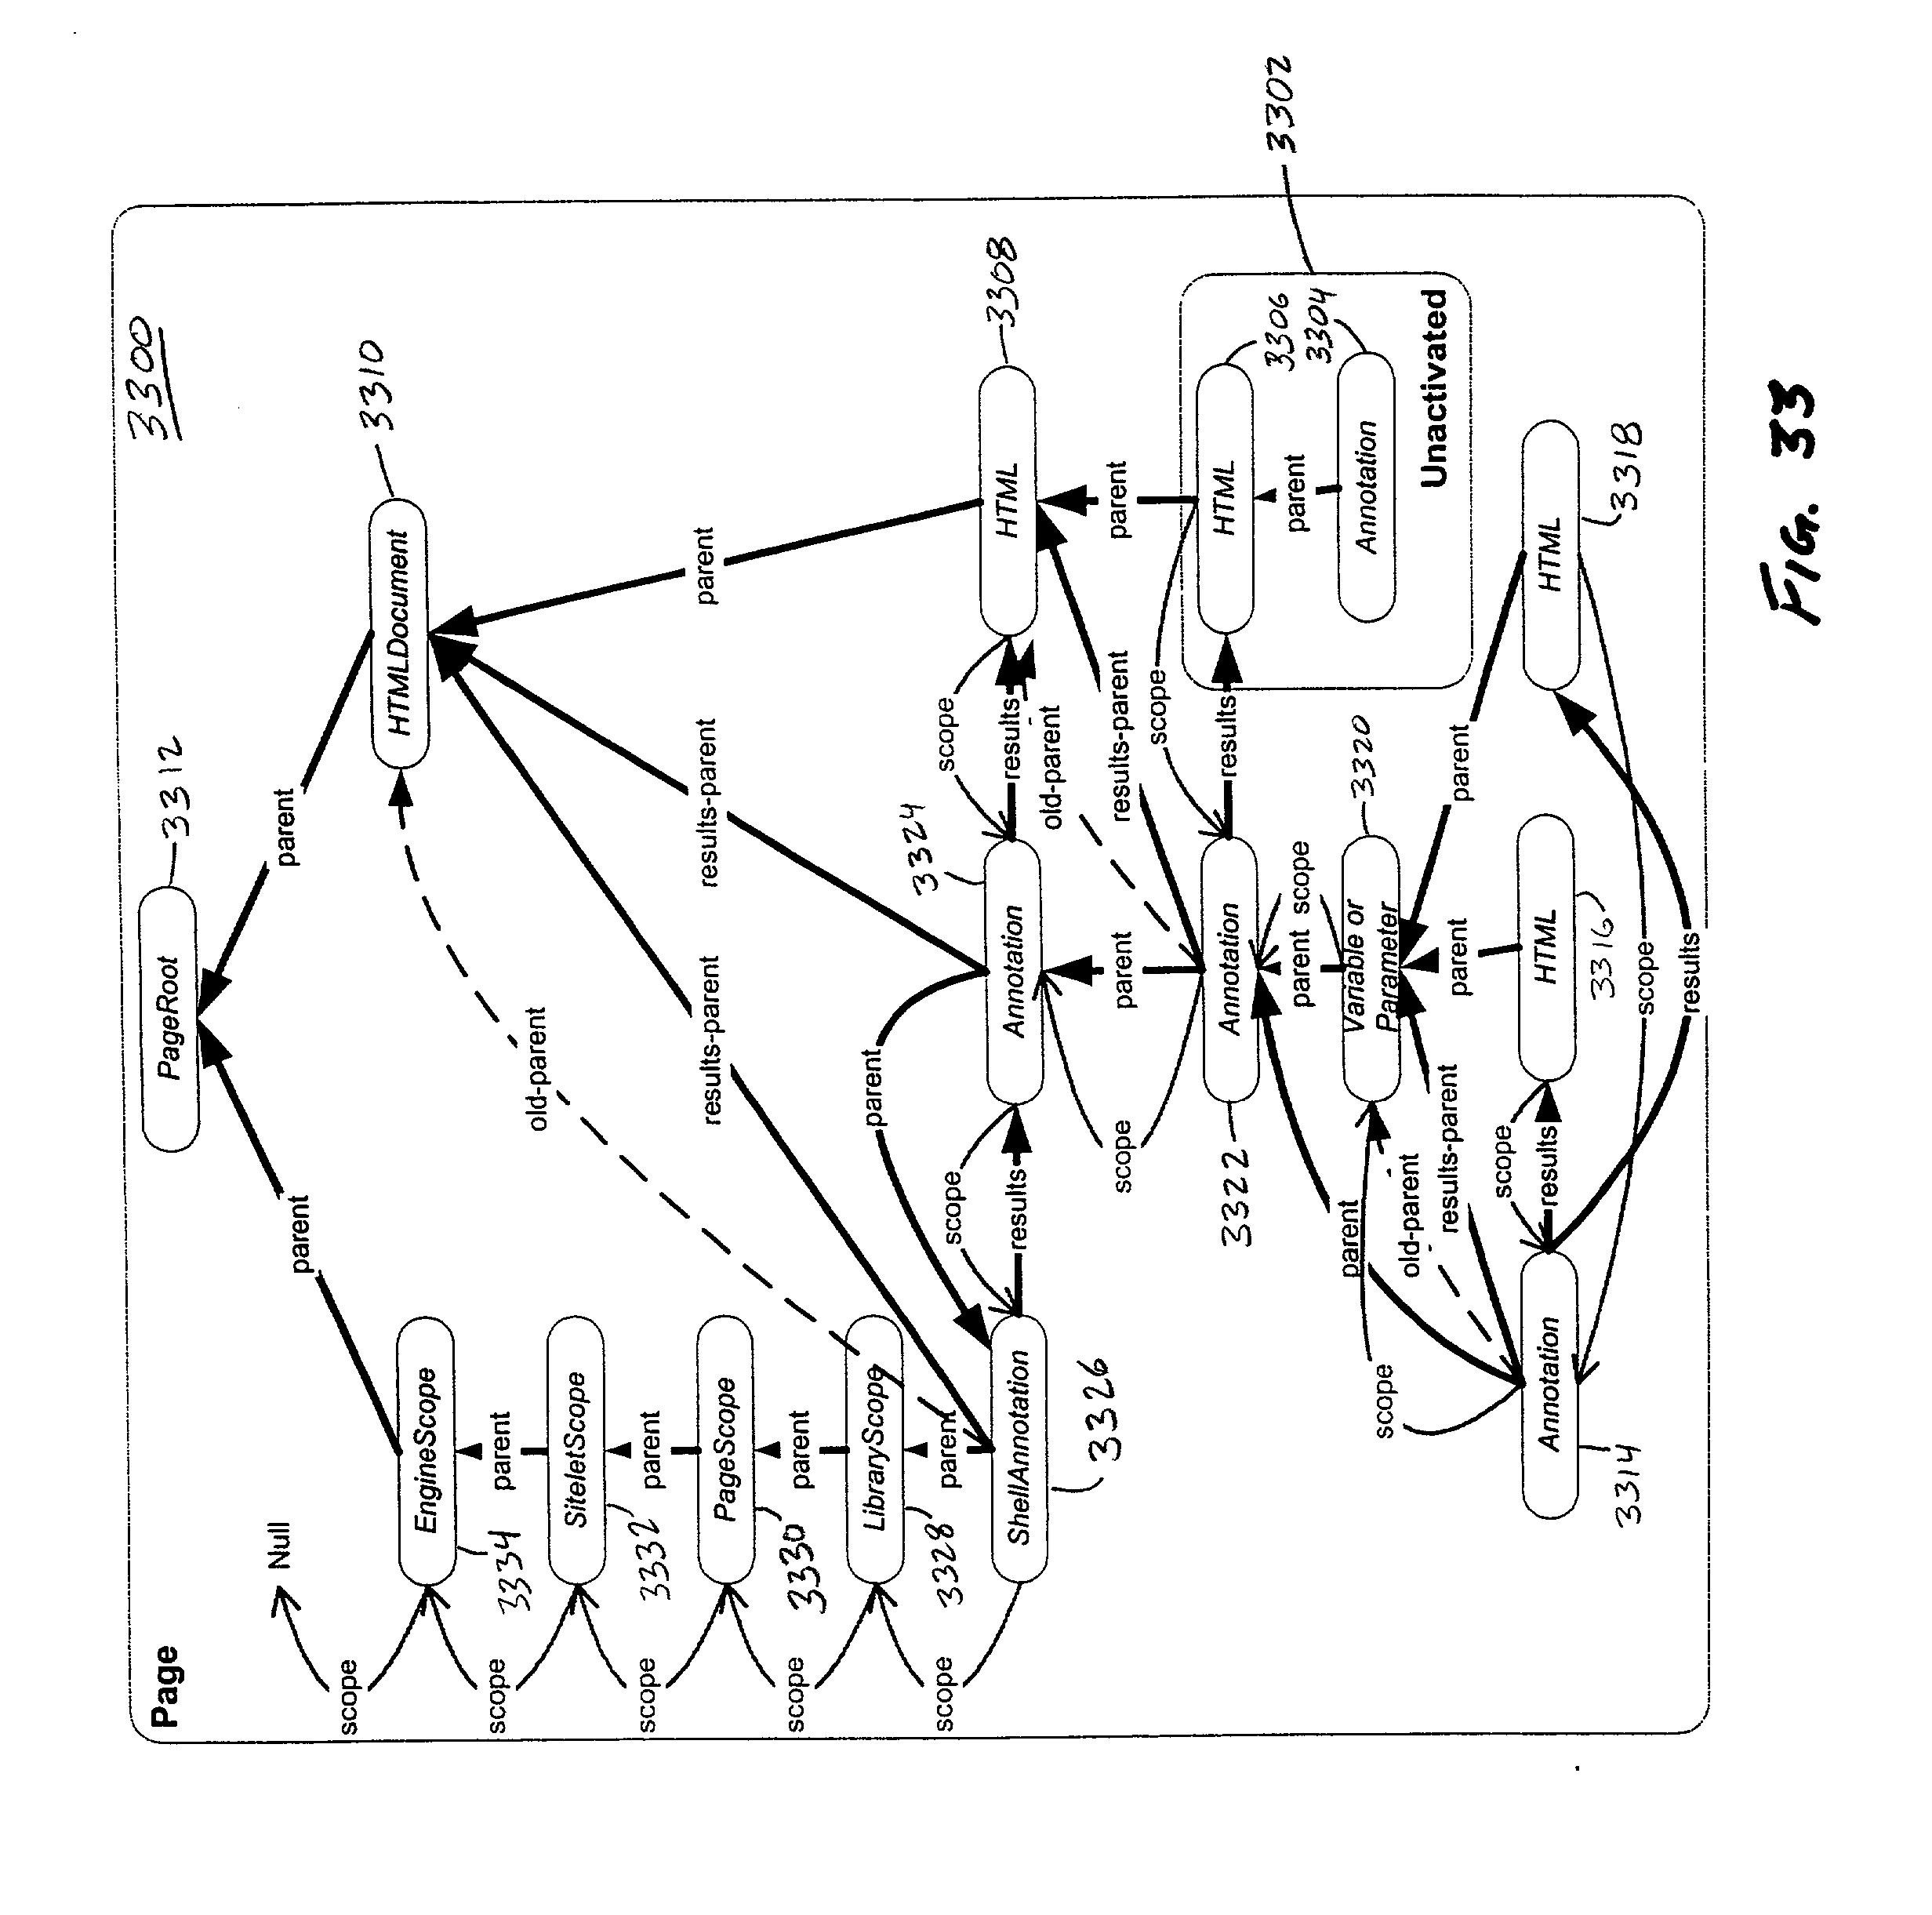 Marklin Wiring Diagrams Marklin Free Engine Image For